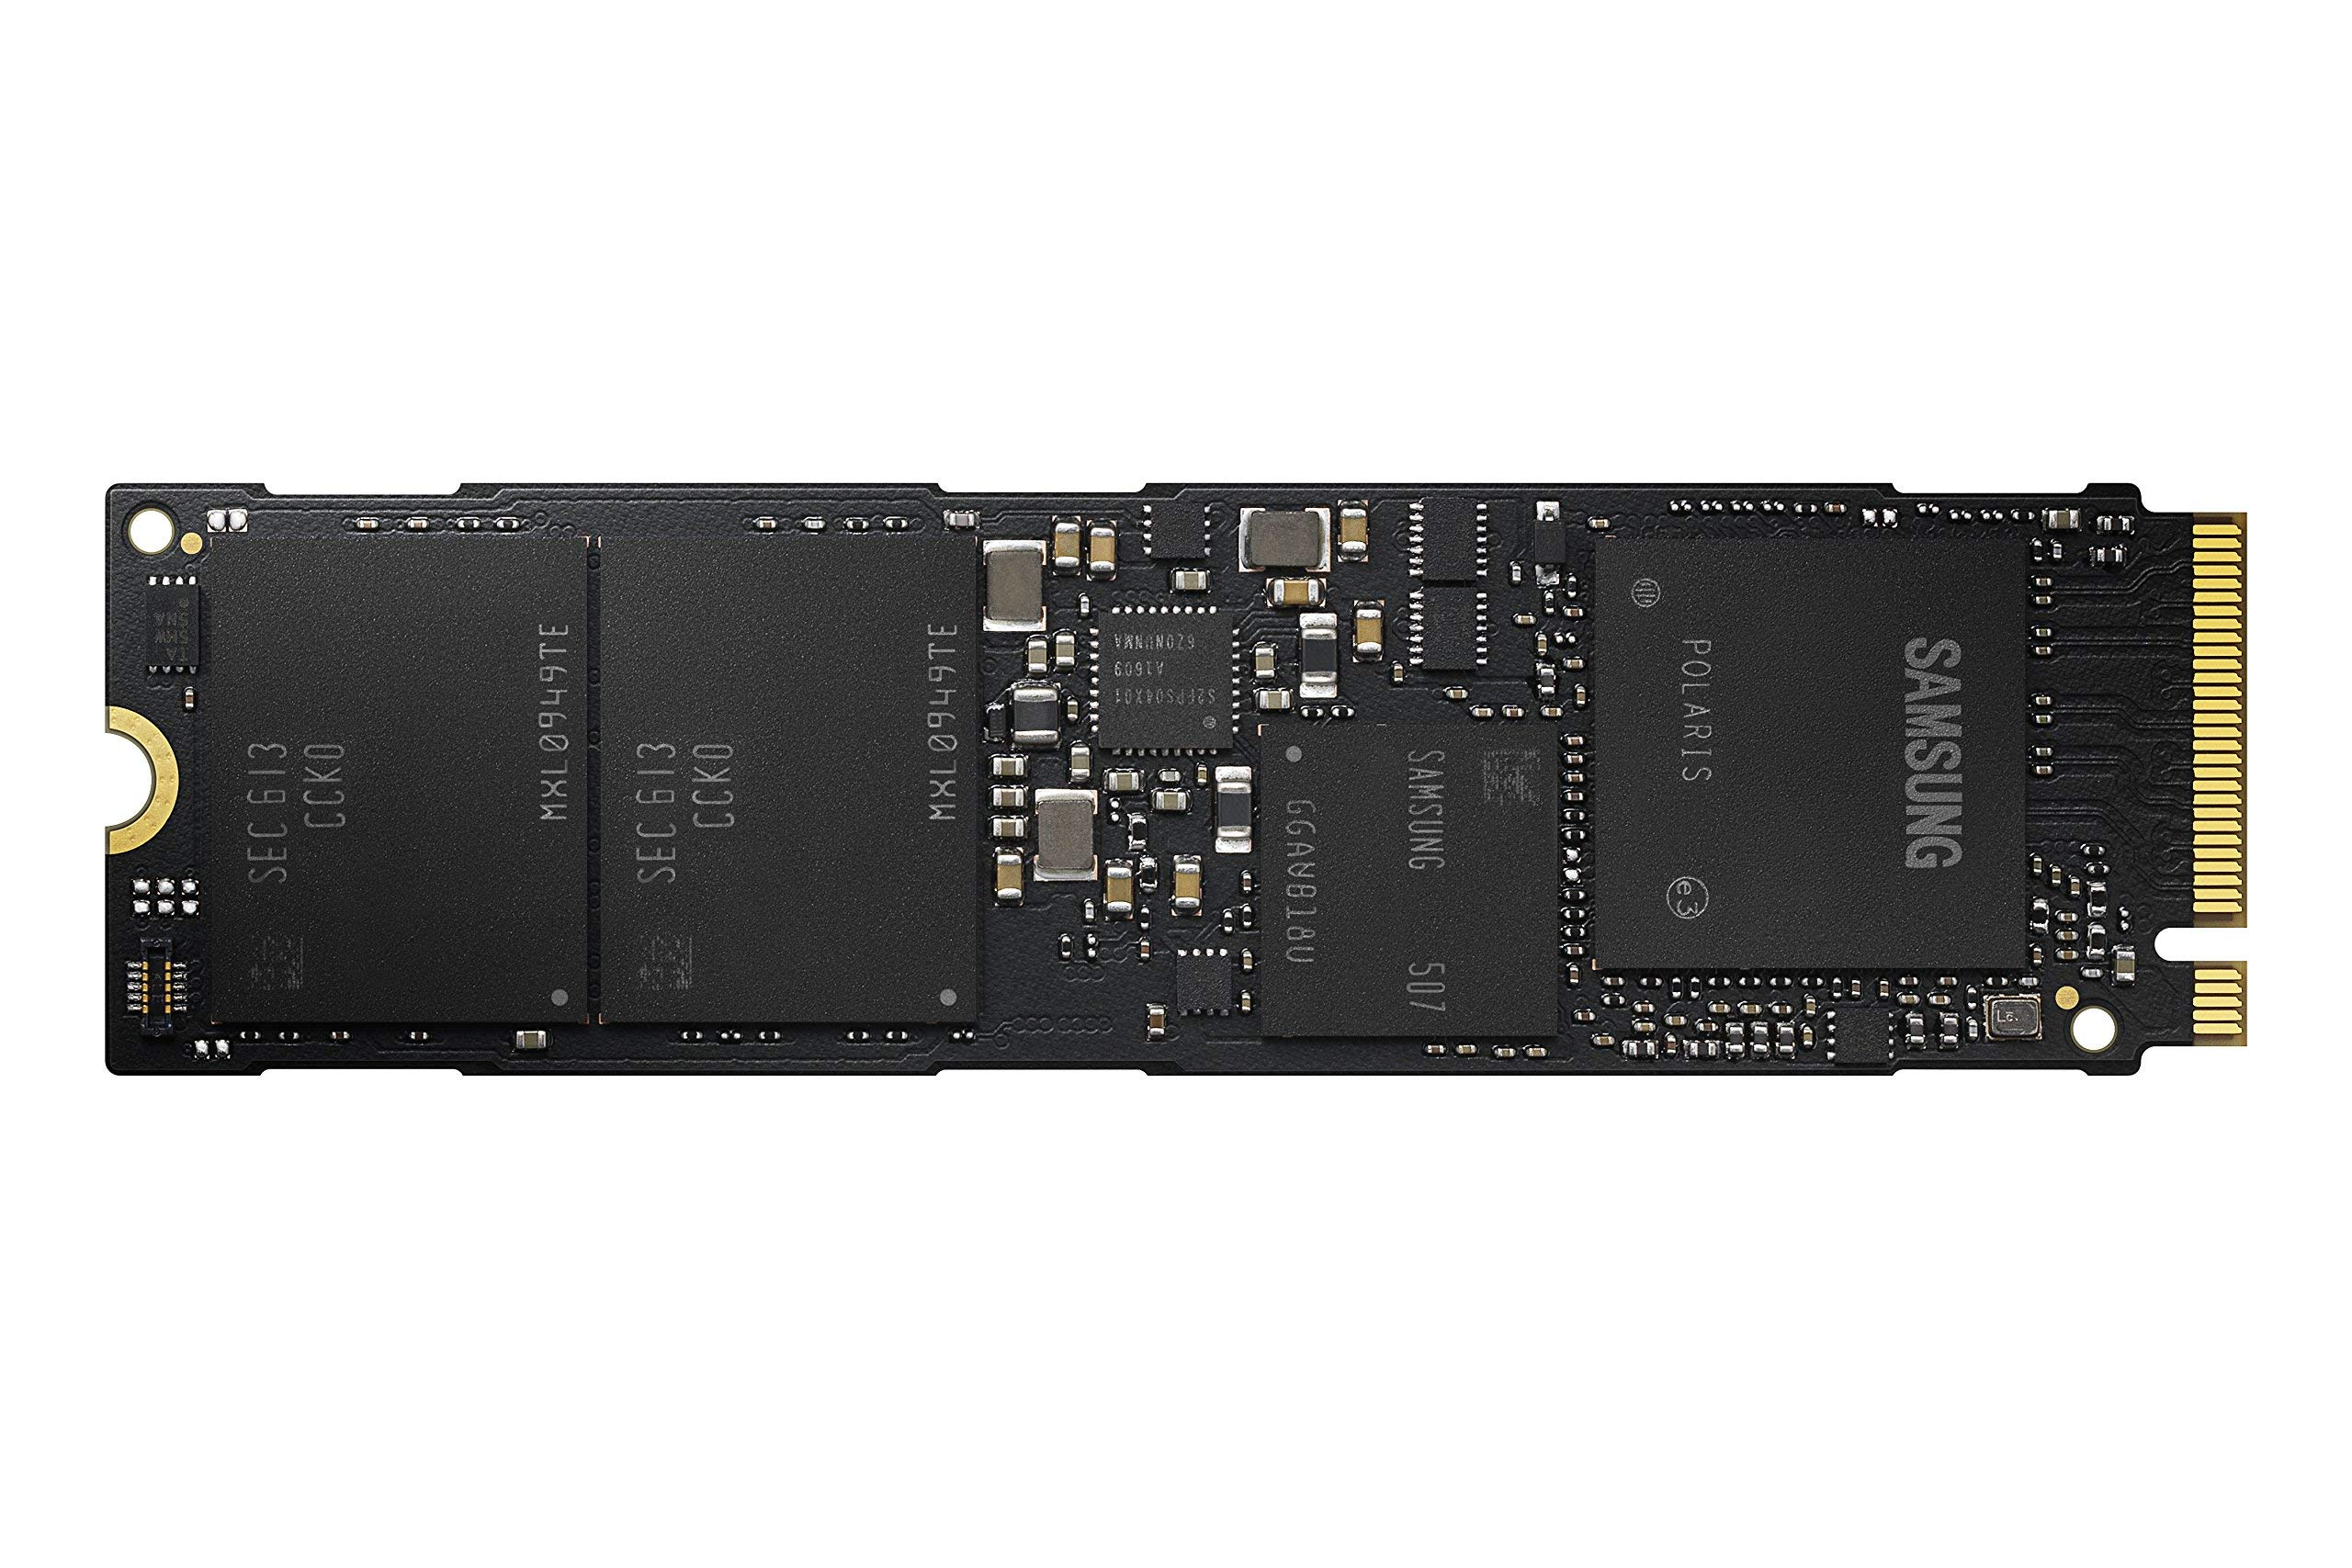 Samsung 960 EVO Series - 500GB NVMe - M.2 Internal SSD (MZ-V6E500BW) (Renewed) by Samsung (Image #4)